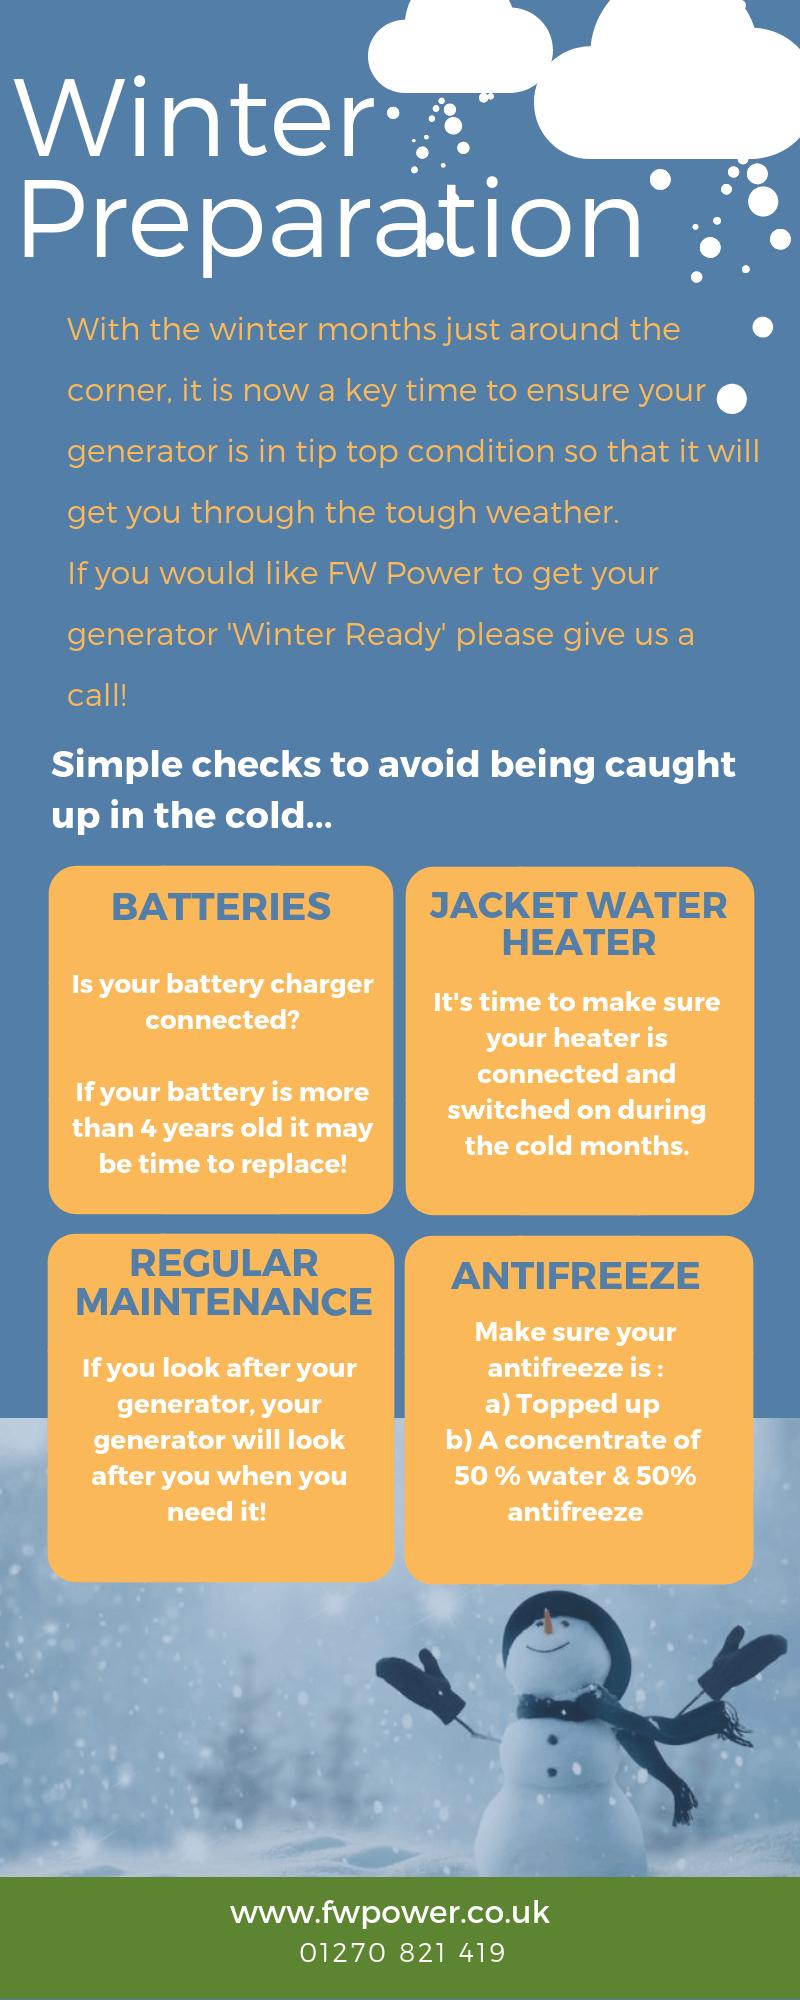 FW Power winter preparation advise for your diesel generator